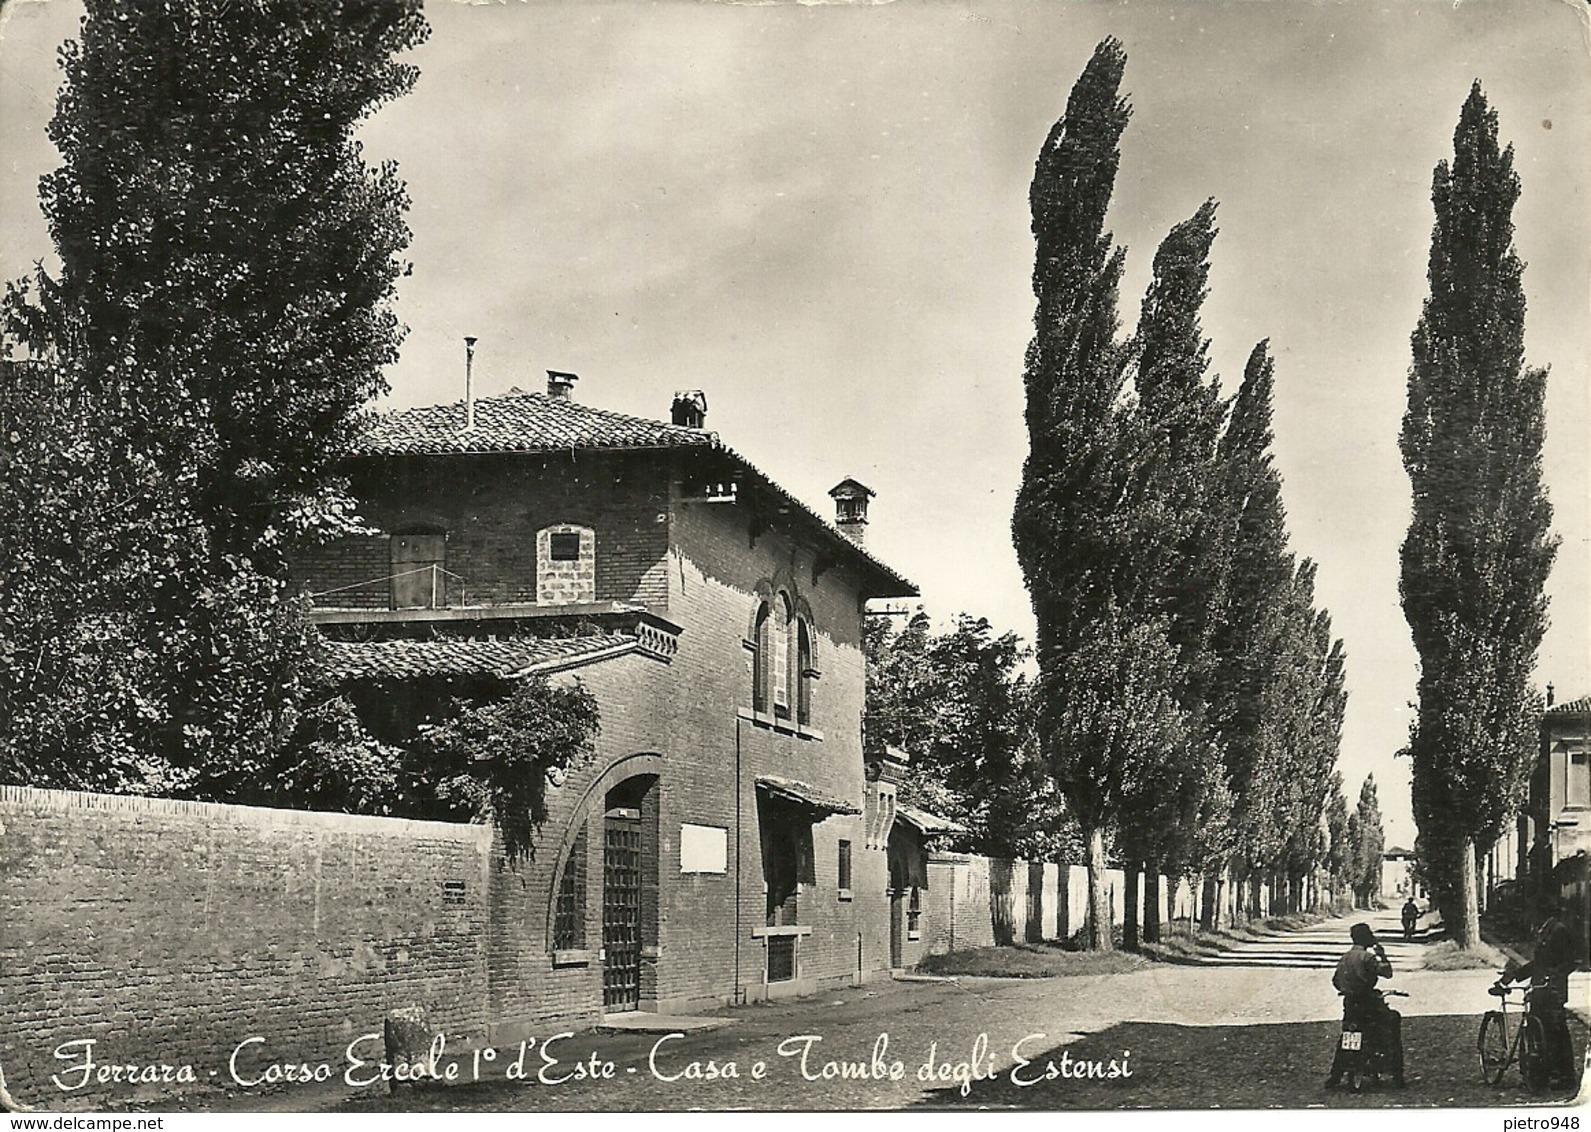 Ferrara (E. Romagna) Corso Ercole 1° D'Este, Casa E Tombe Degli Estensi, Ercole 1° D'Este Avenue - Ferrara